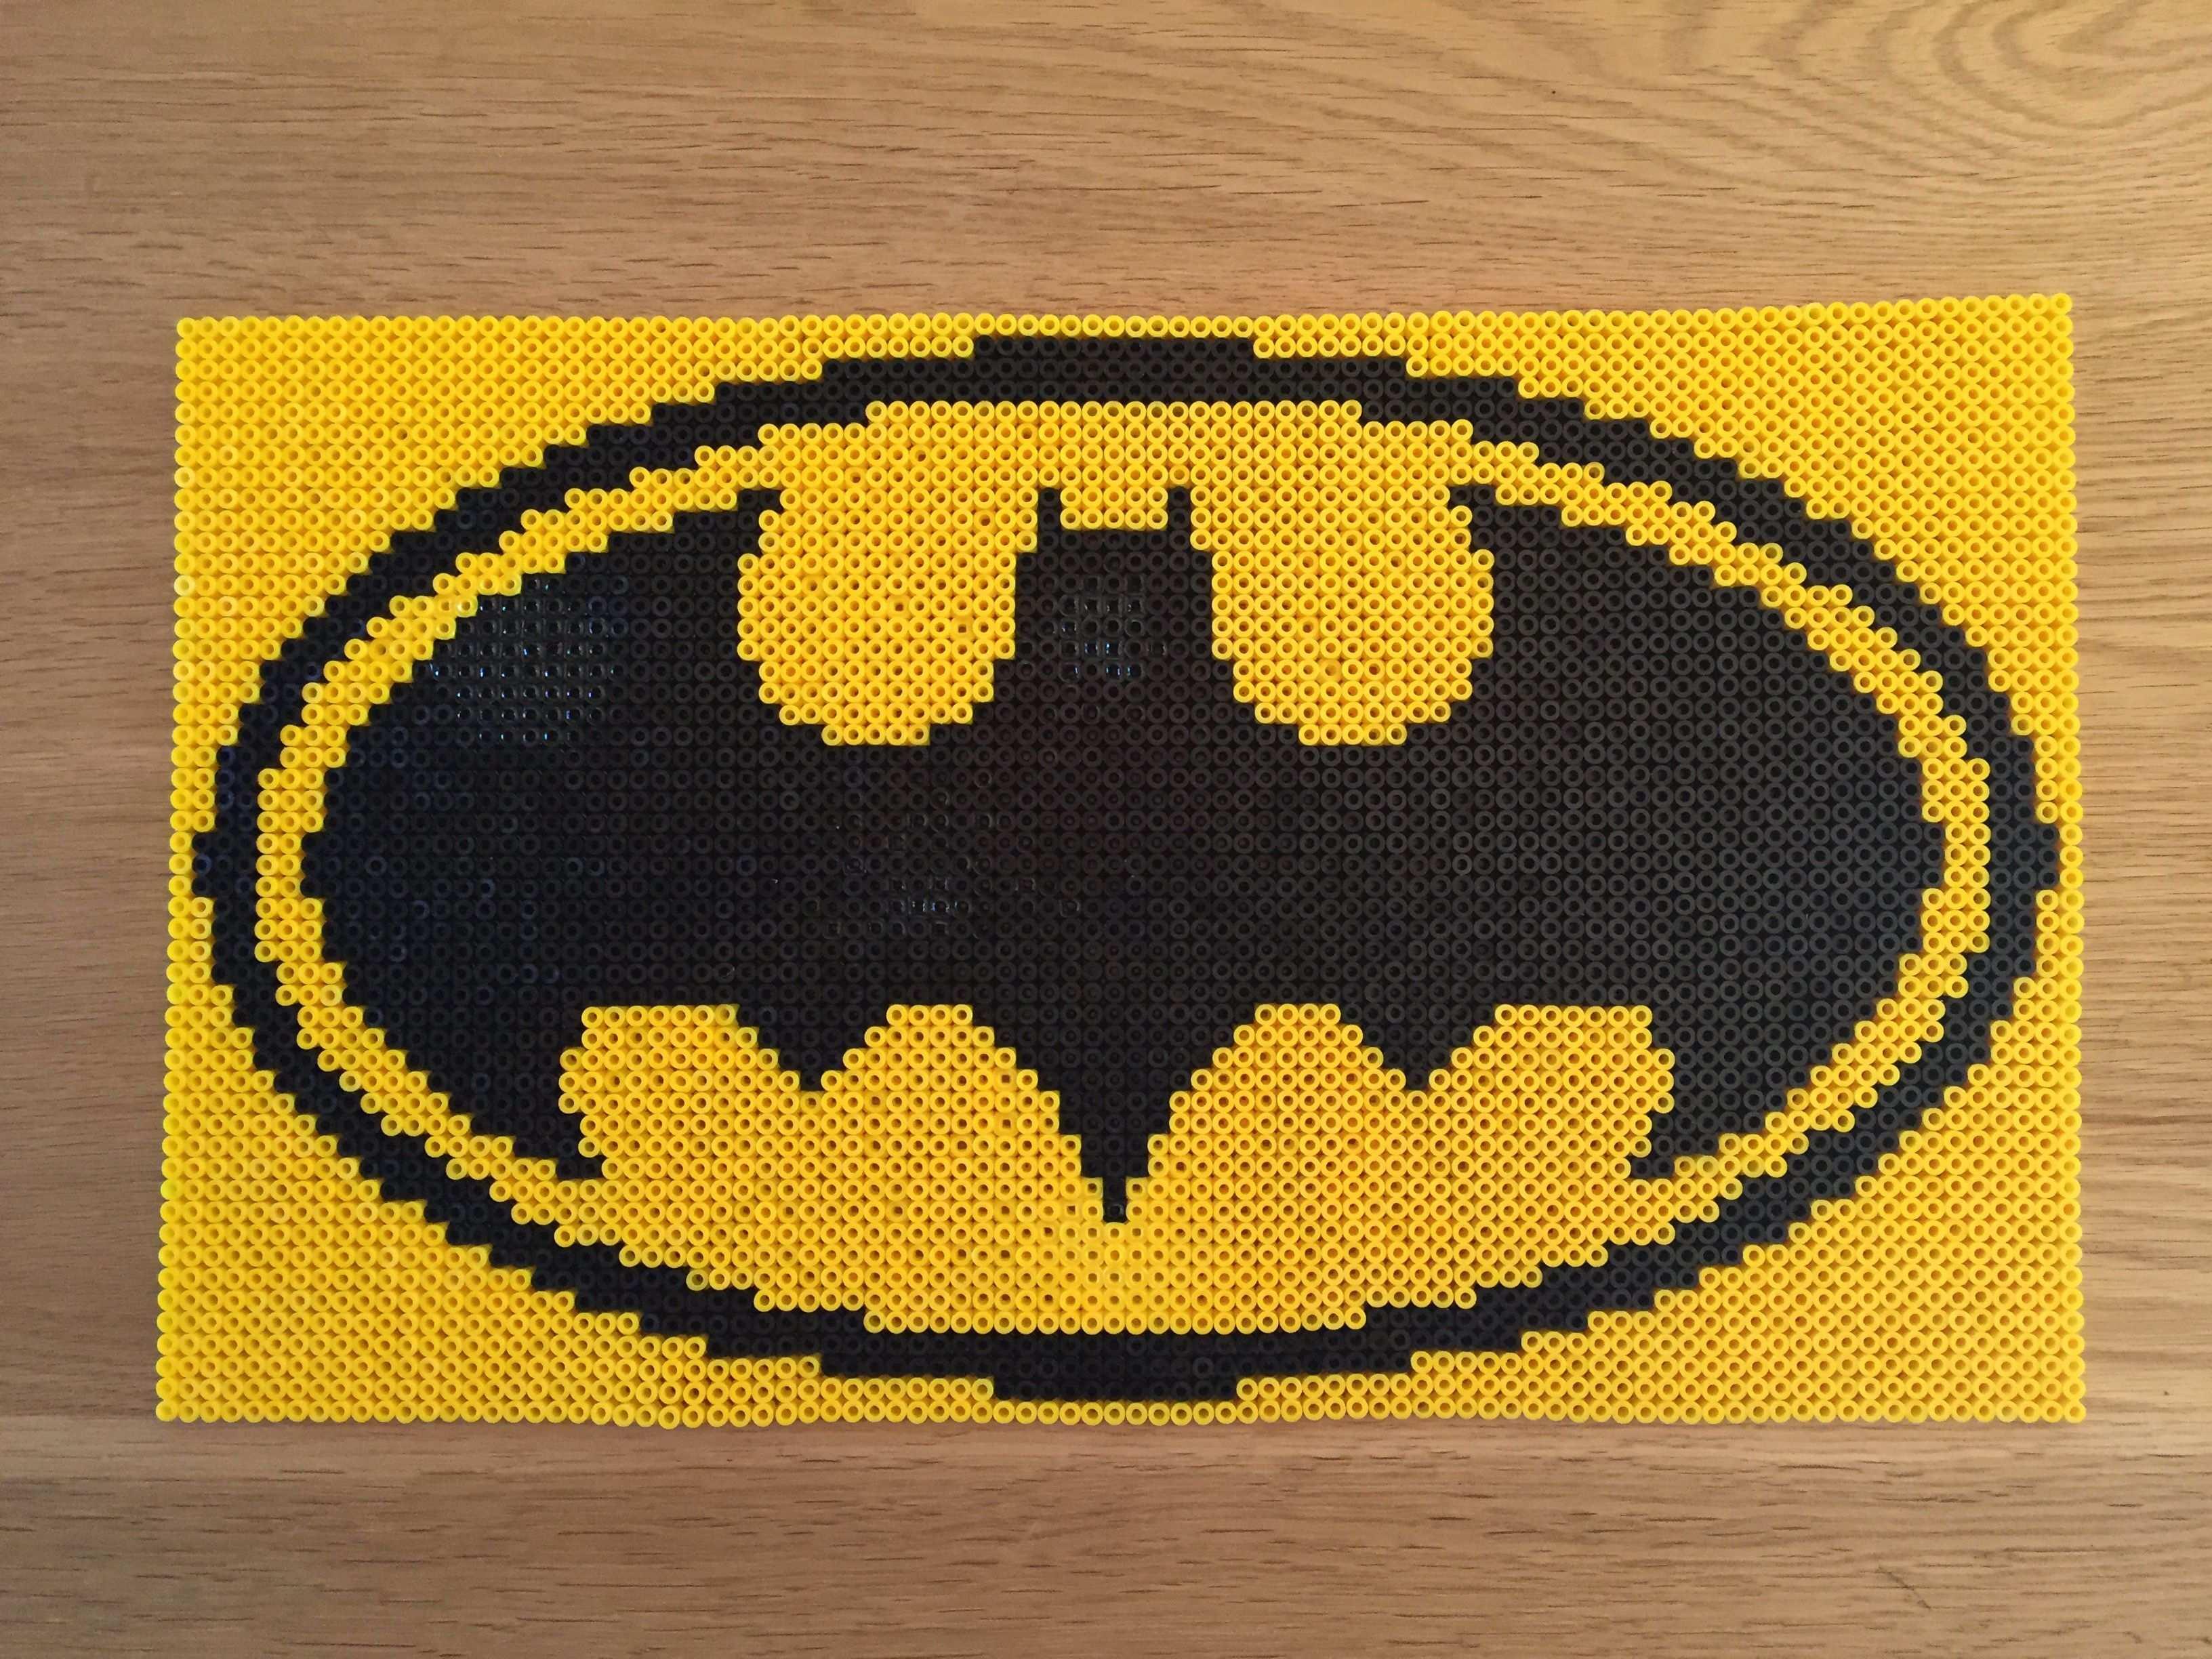 Batman Logo Made With Hama Beads Bugelperlen Vorlagen Batman Logo Batman